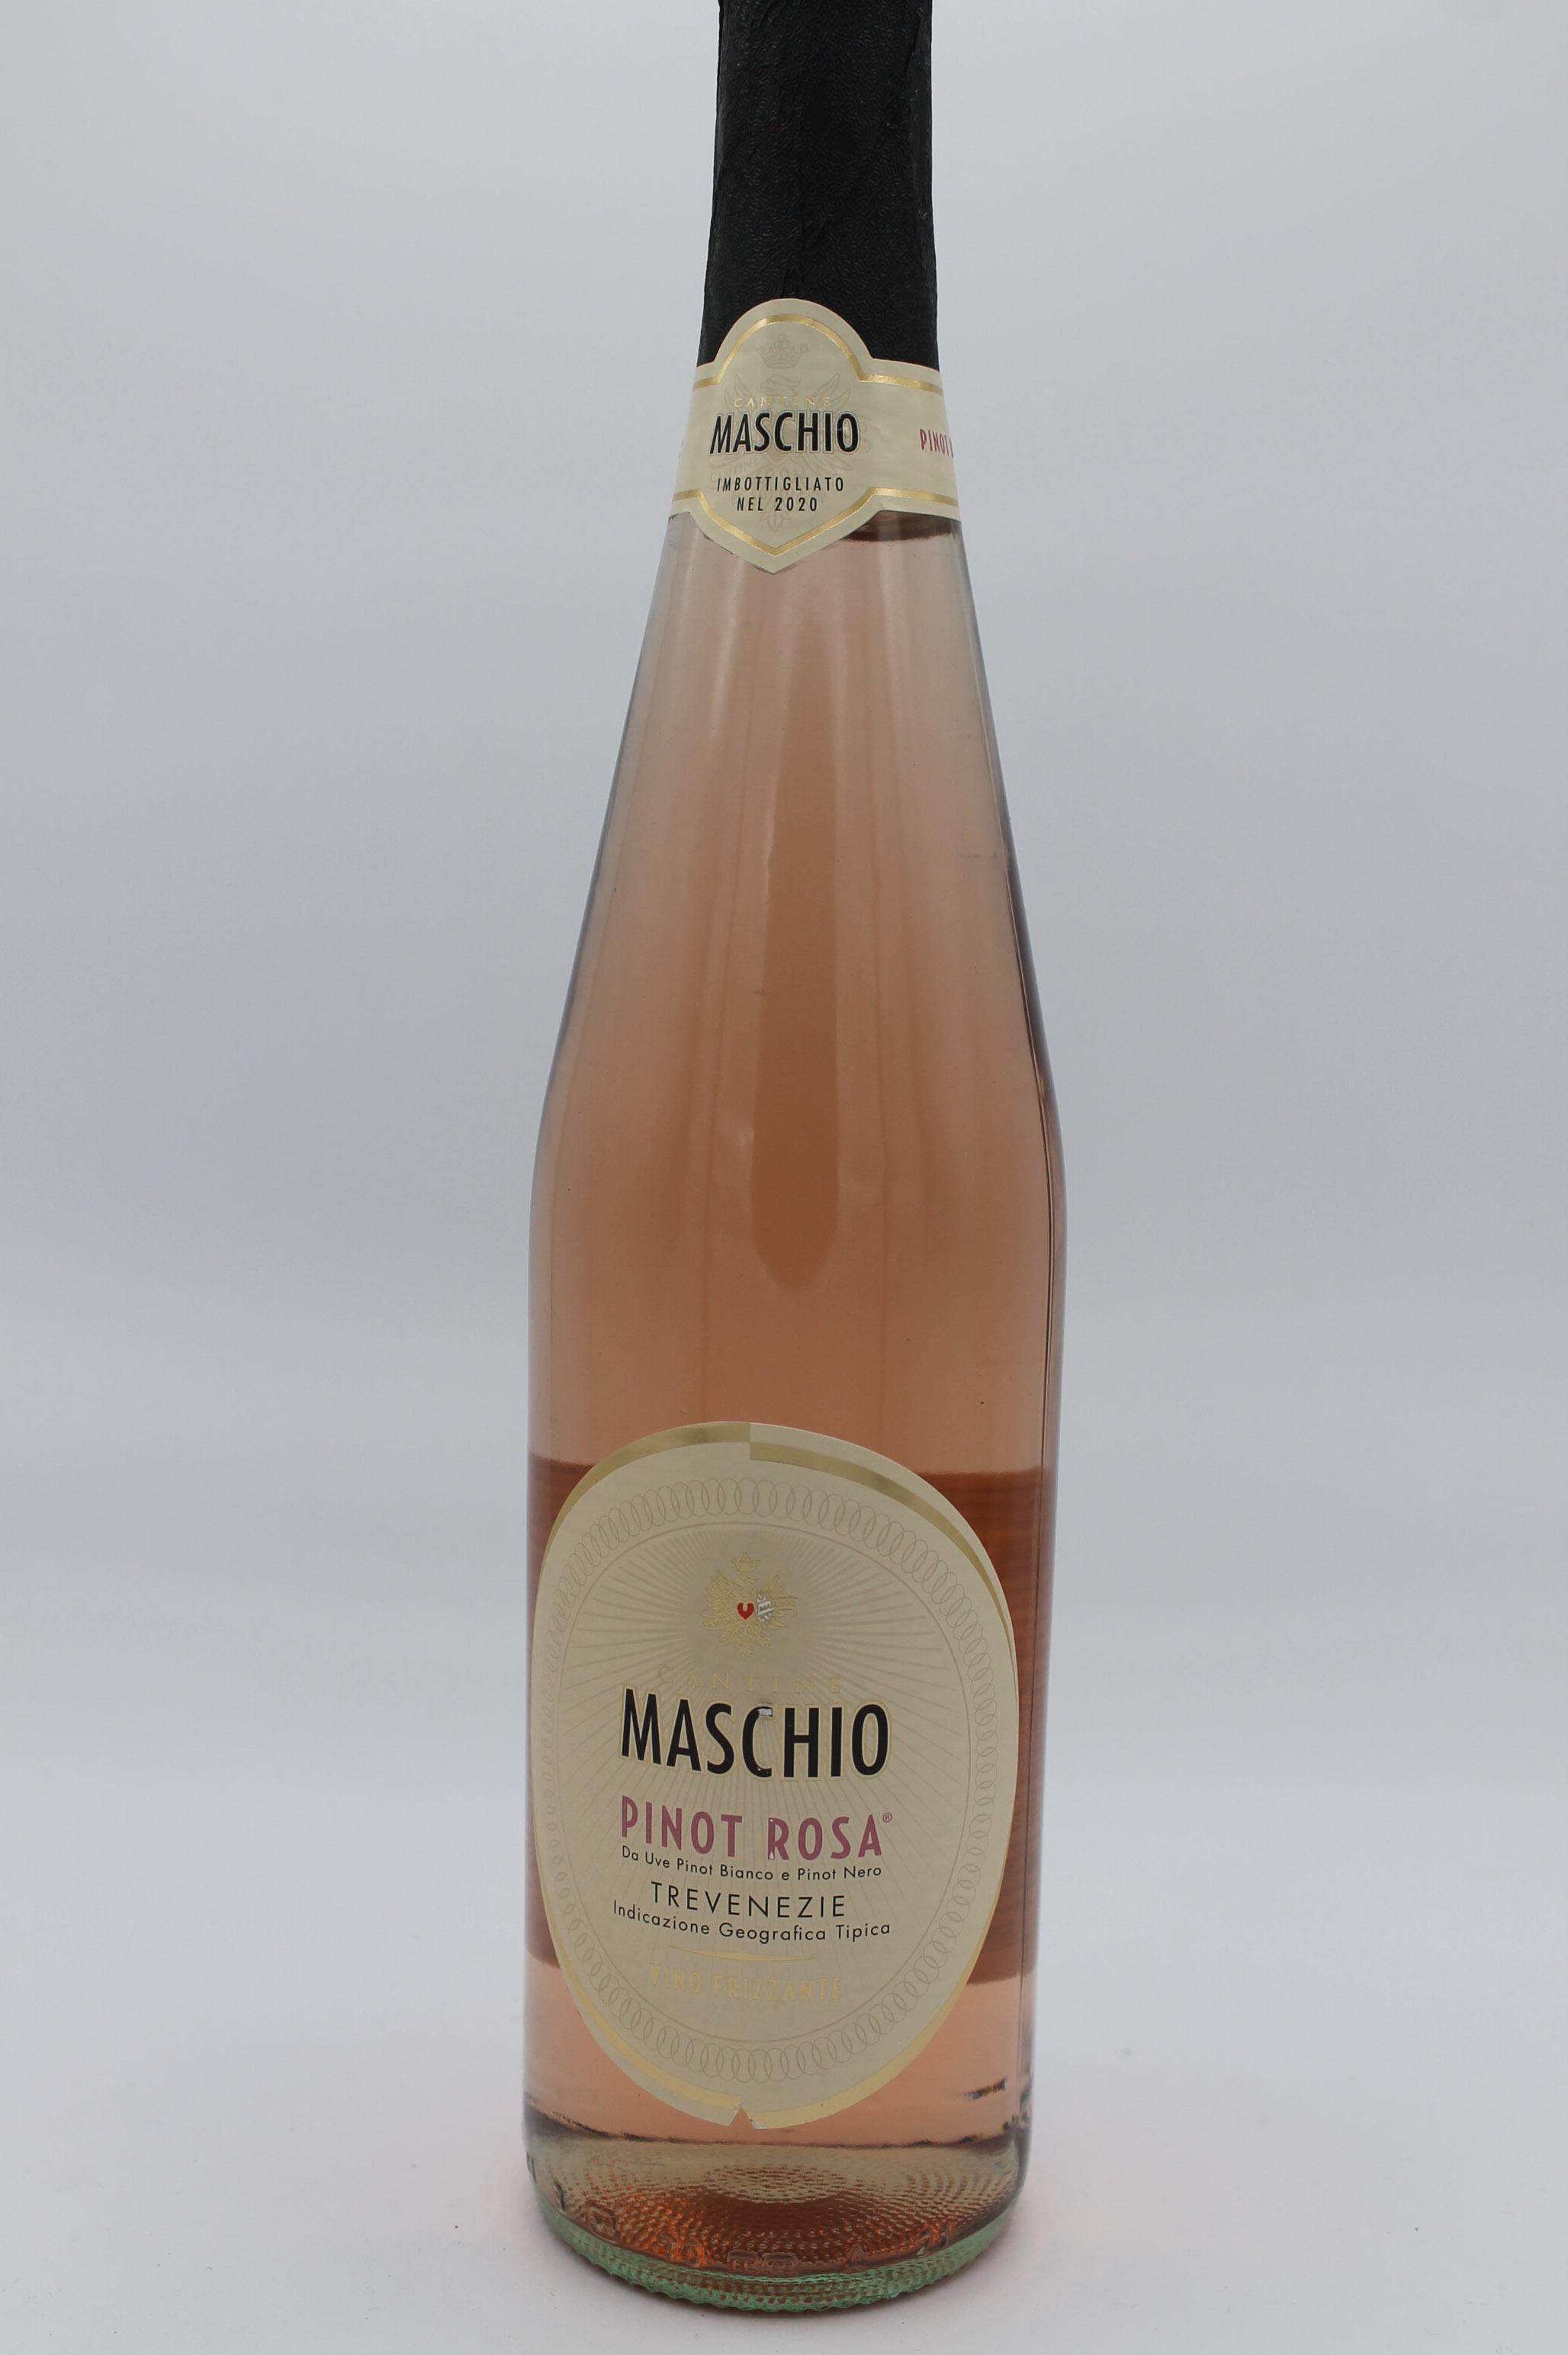 Trevenezie pinot rosa IGT frizzante 750ml.